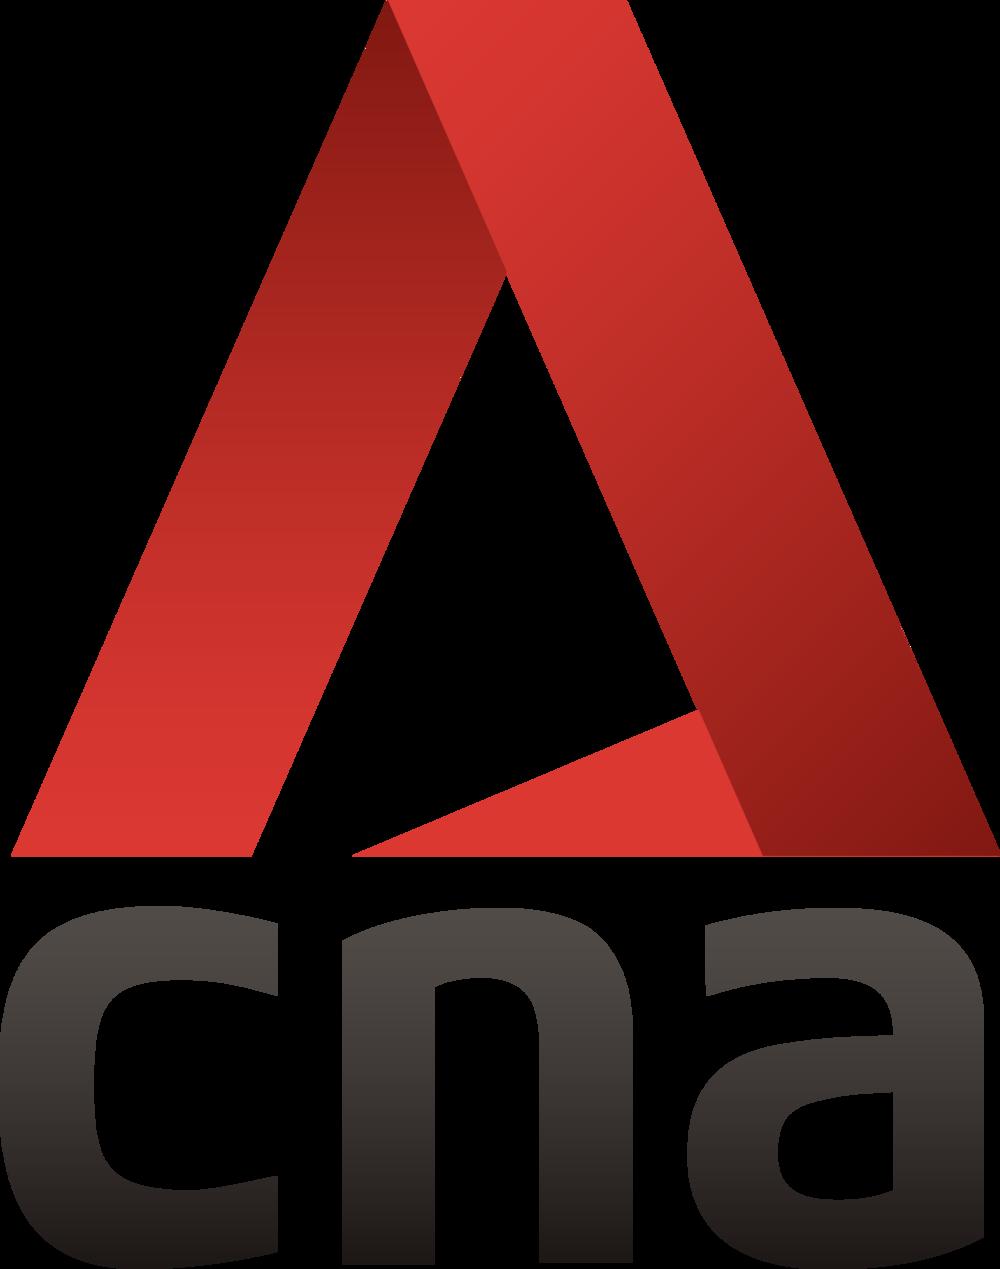 CNA logo 2019 Vertical.png